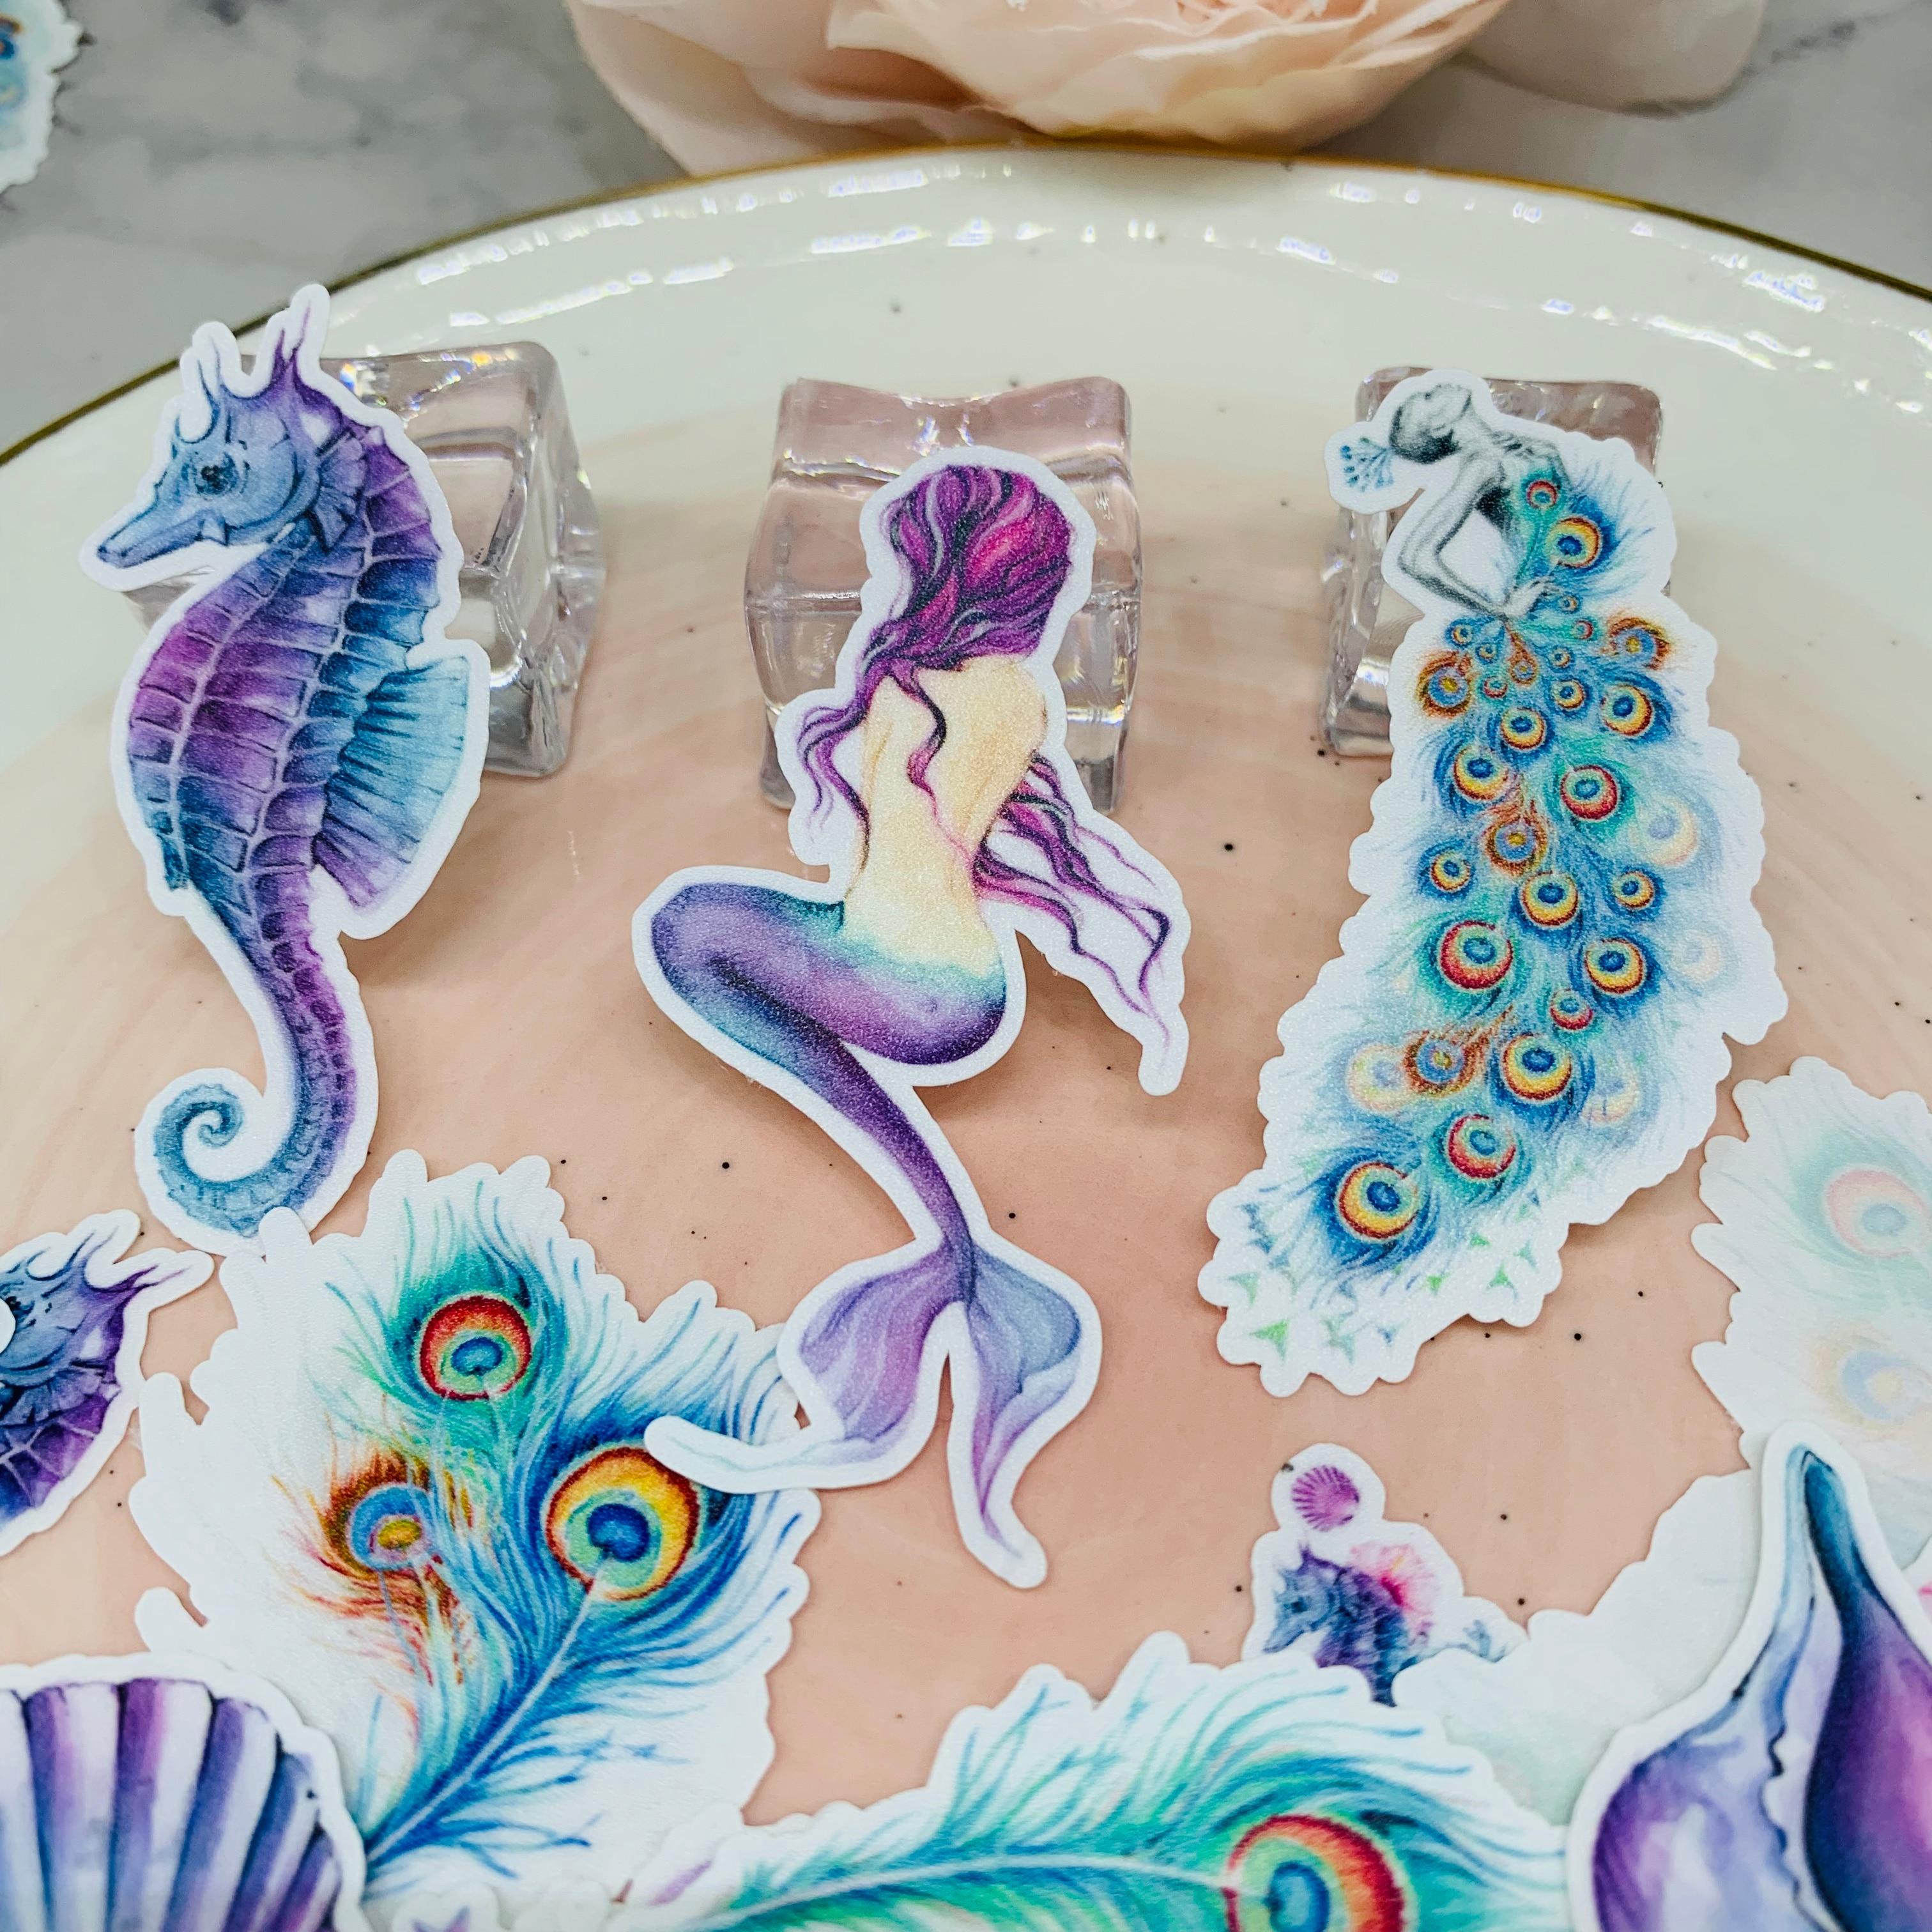 21Pcs/Pack Vintage Mermaid Feather A Hippocampus Sticker DIY Scrapbooking Album Junk Journal Planner Decorative Stickers